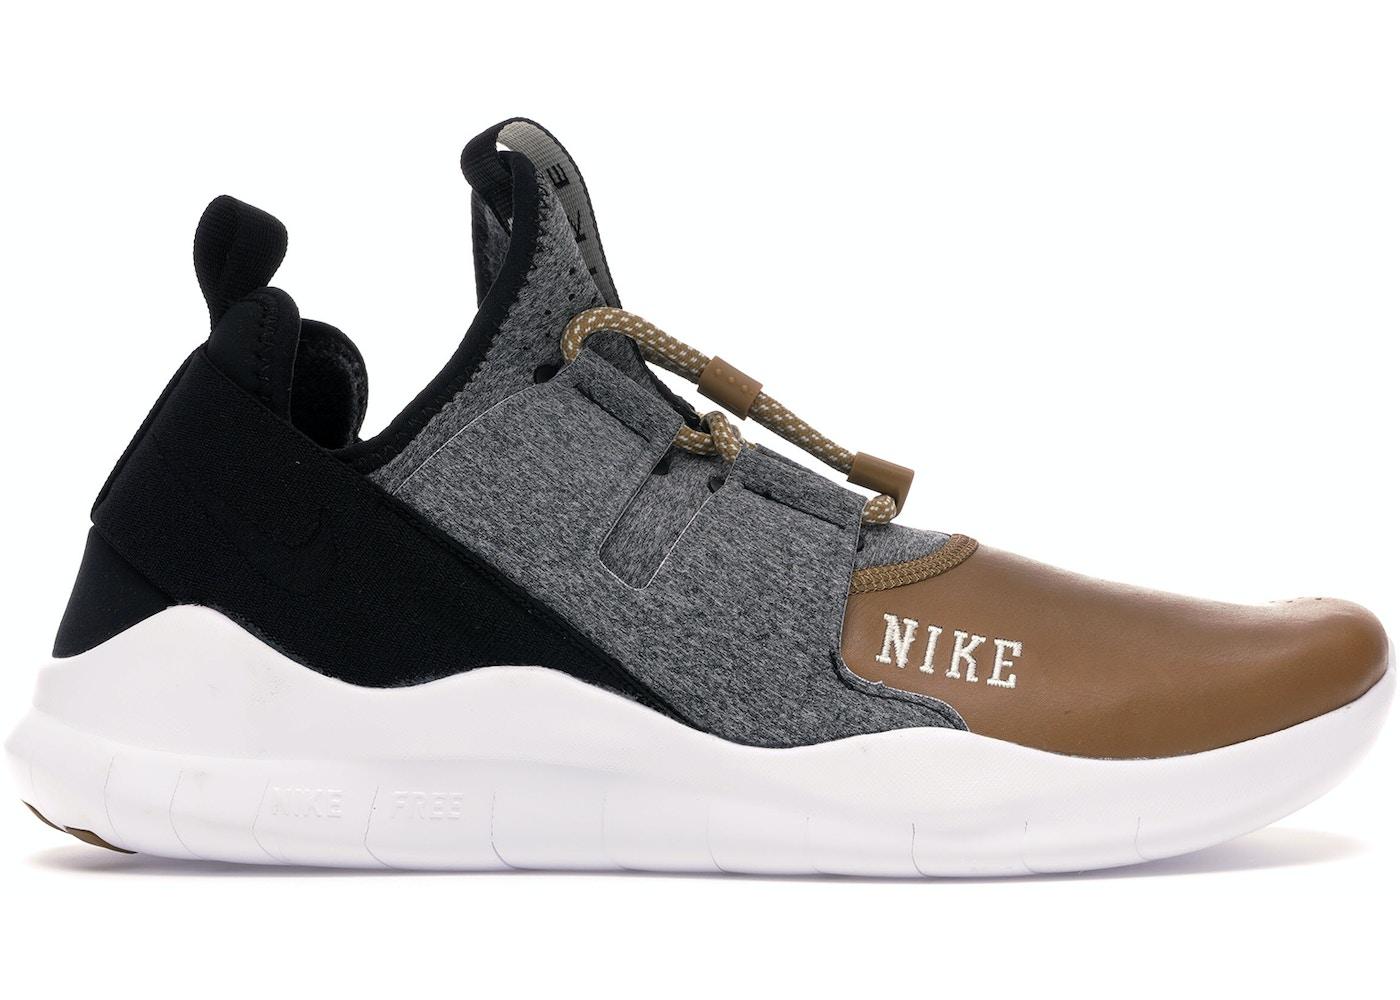 san francisco a8a70 c3258 Nike Free Run CMTR 2018 Varsity Muted Bronze - AH6727-200